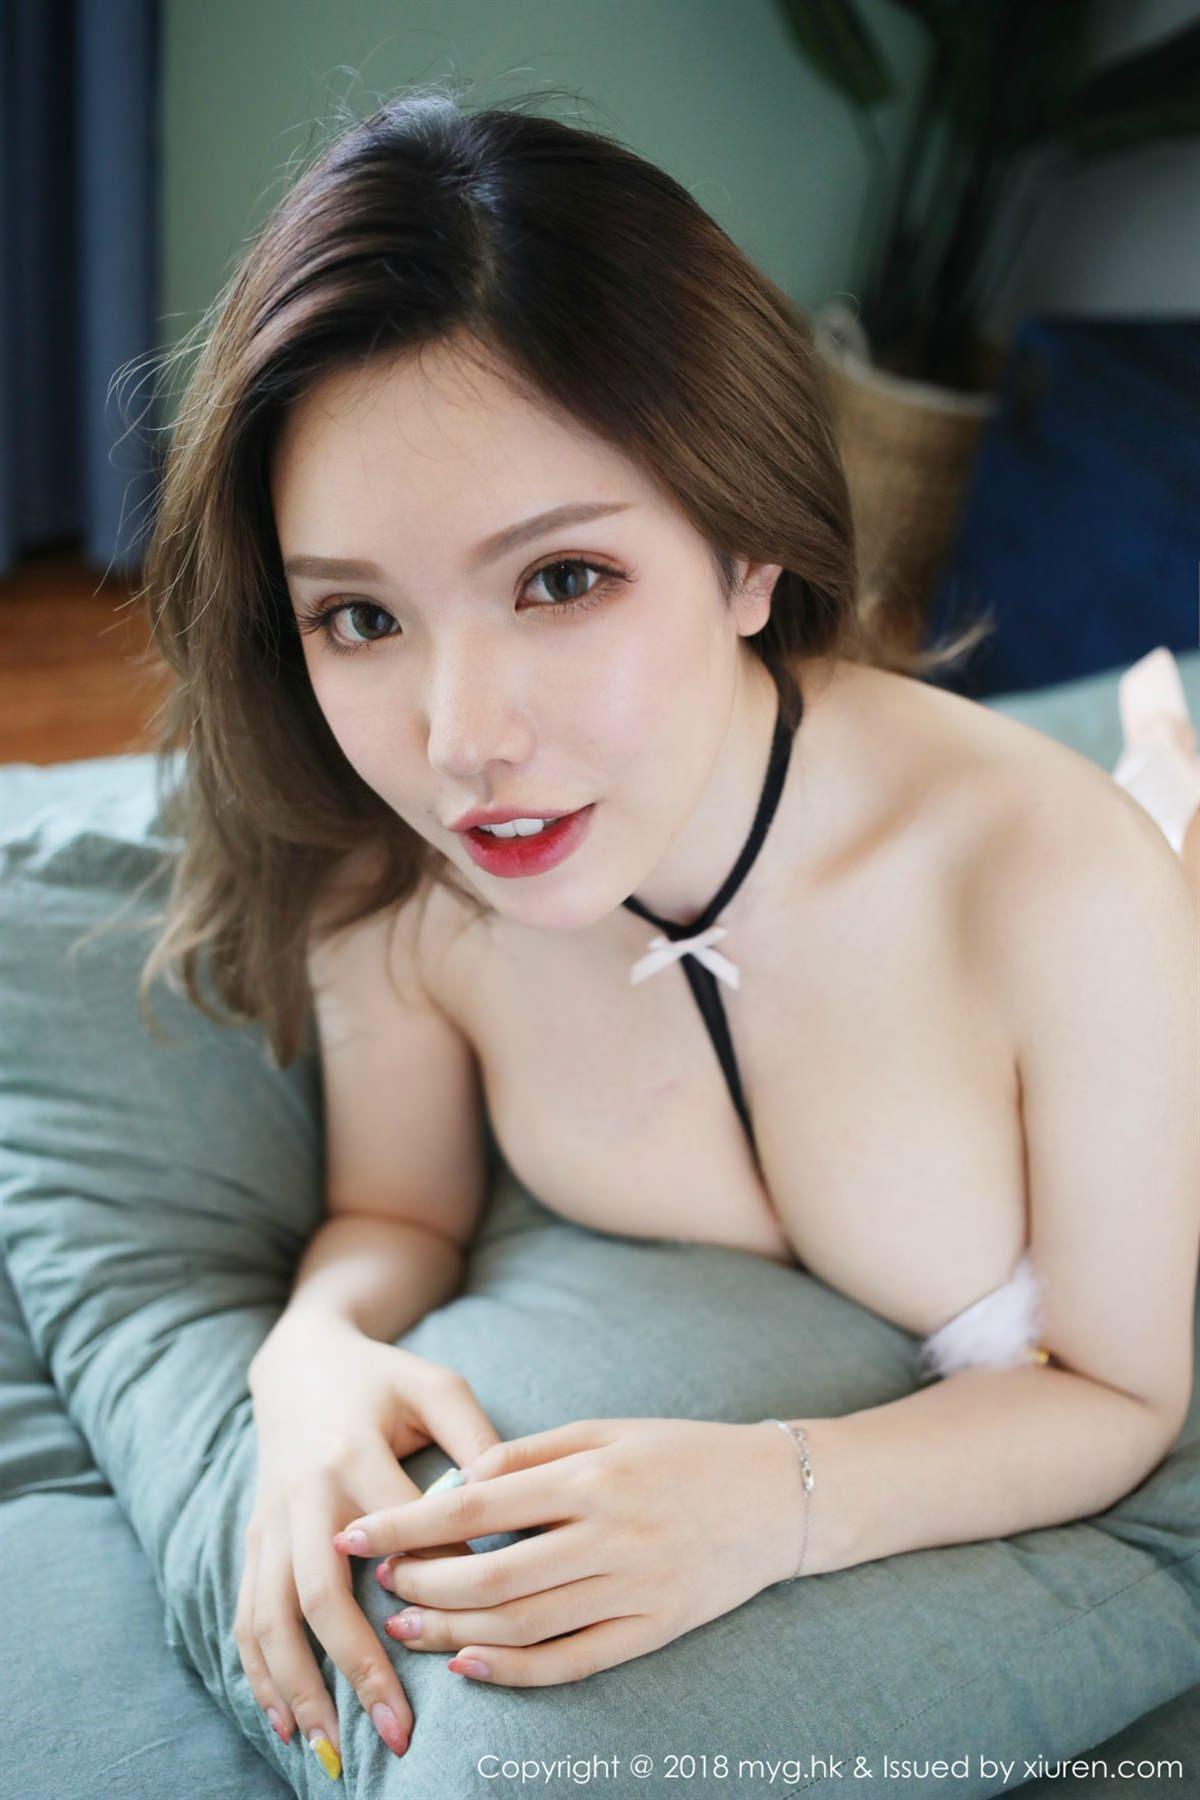 MyGirl Vol.302 46P, Huang Le Ran, mygirl